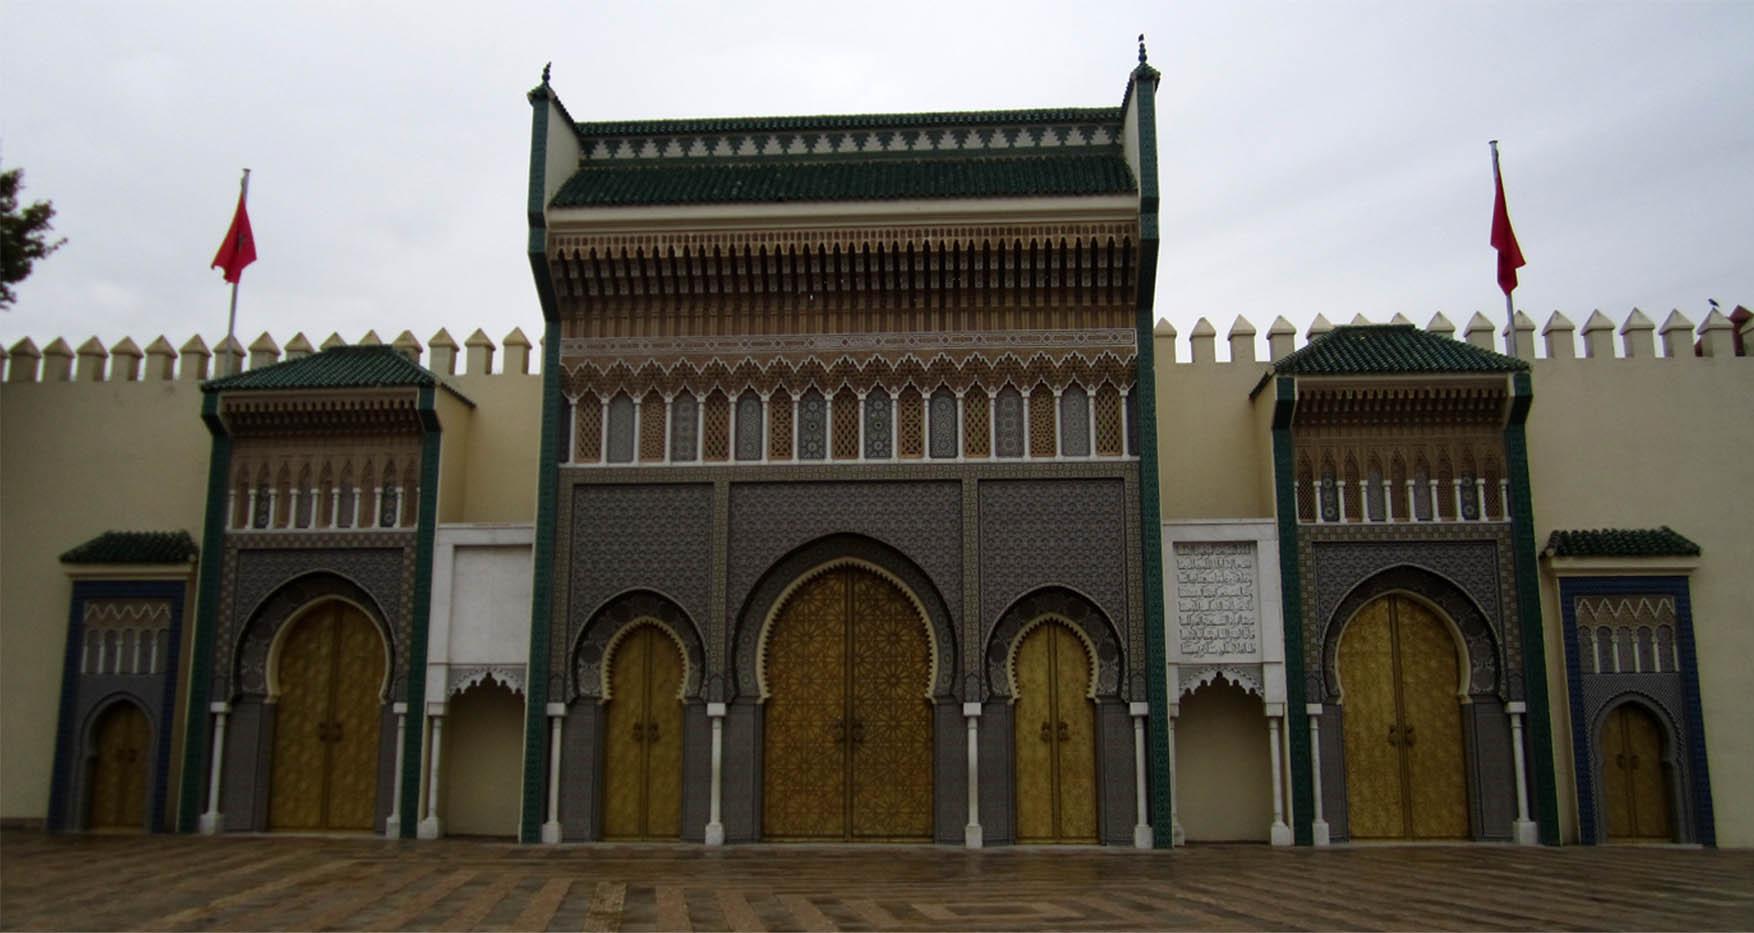 07 fes kraljevska palata